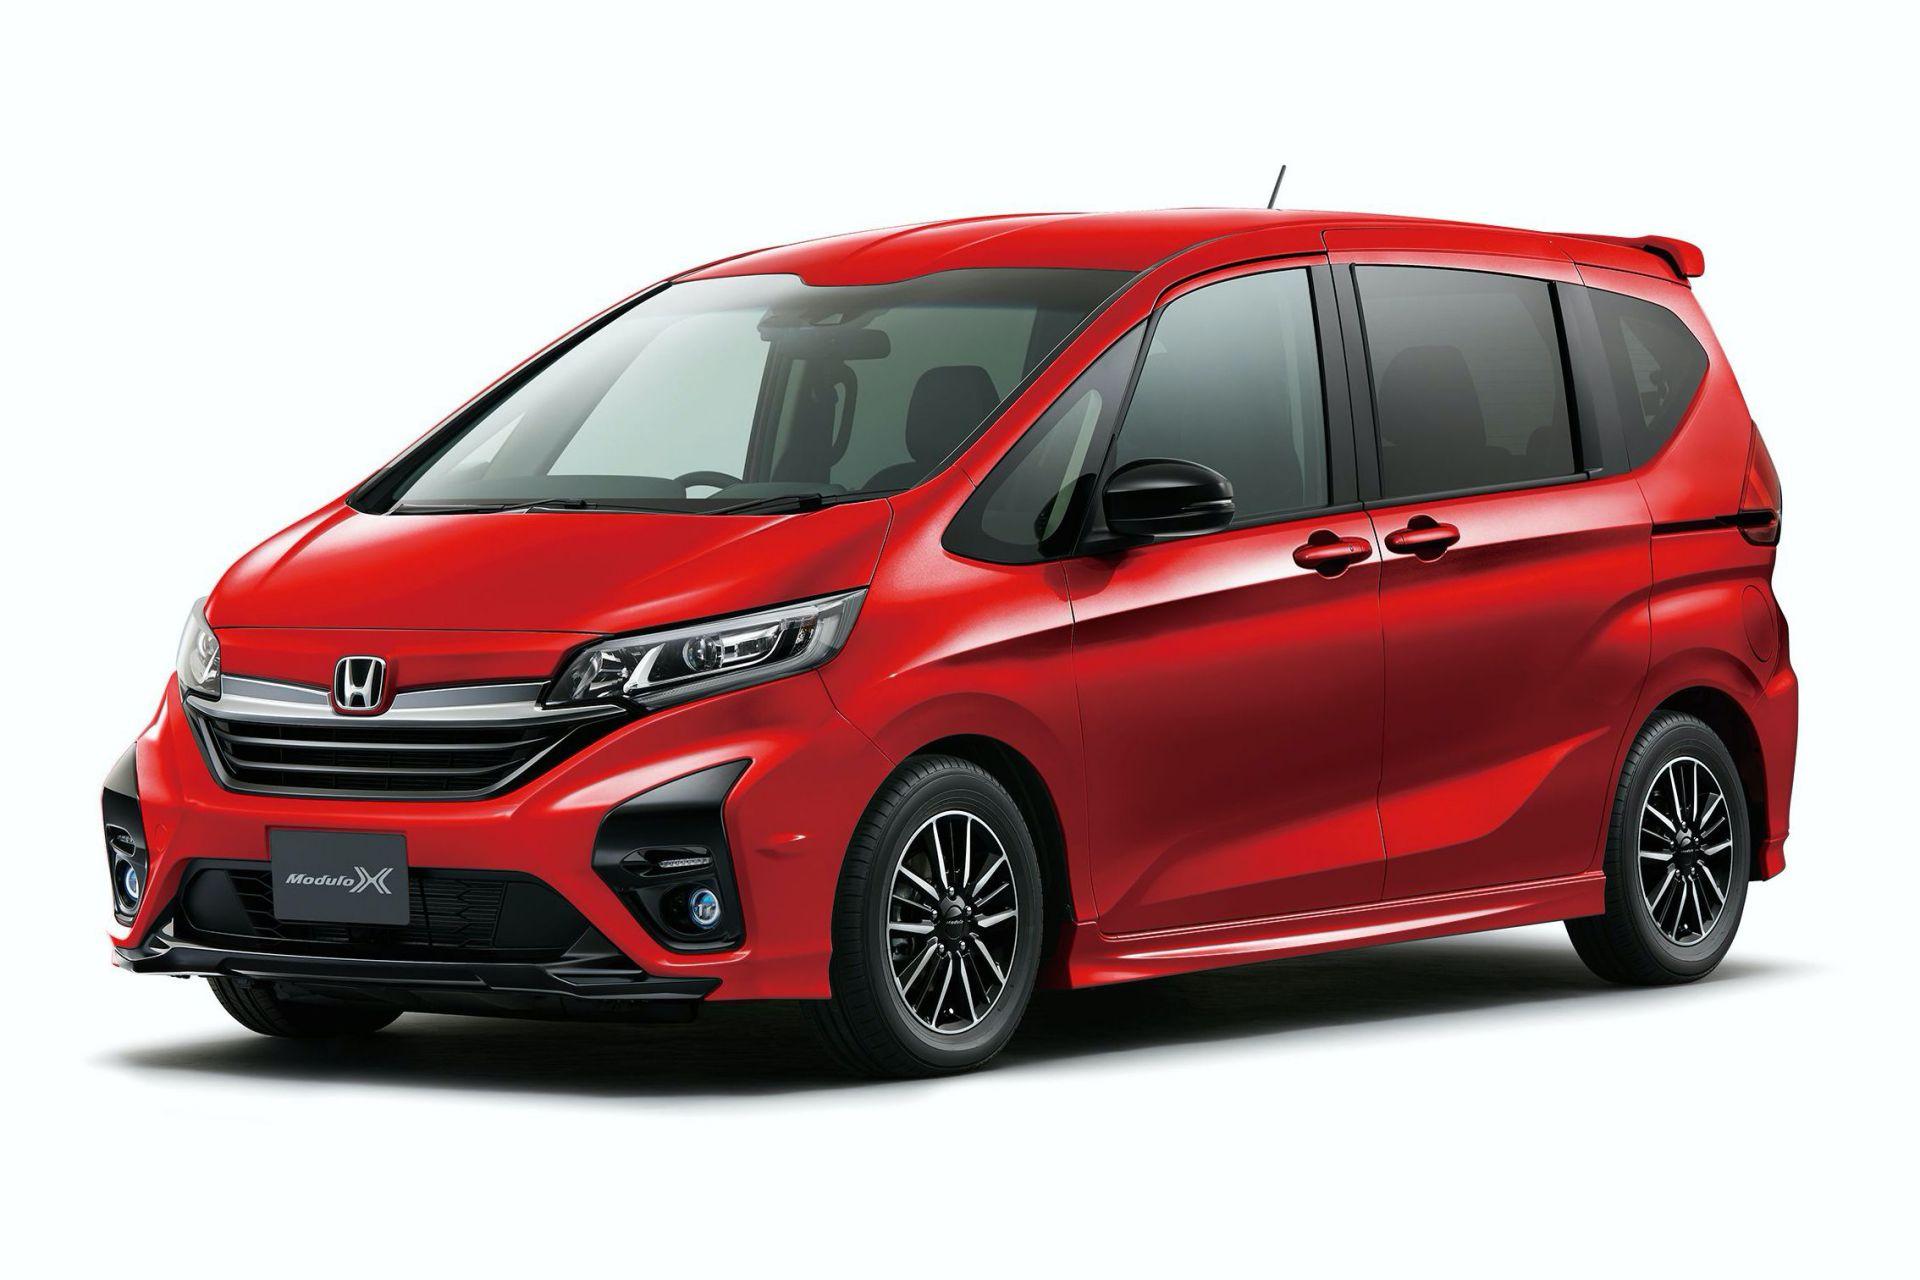 Honda-Freed-Modulo-X-Facelift-2020-34